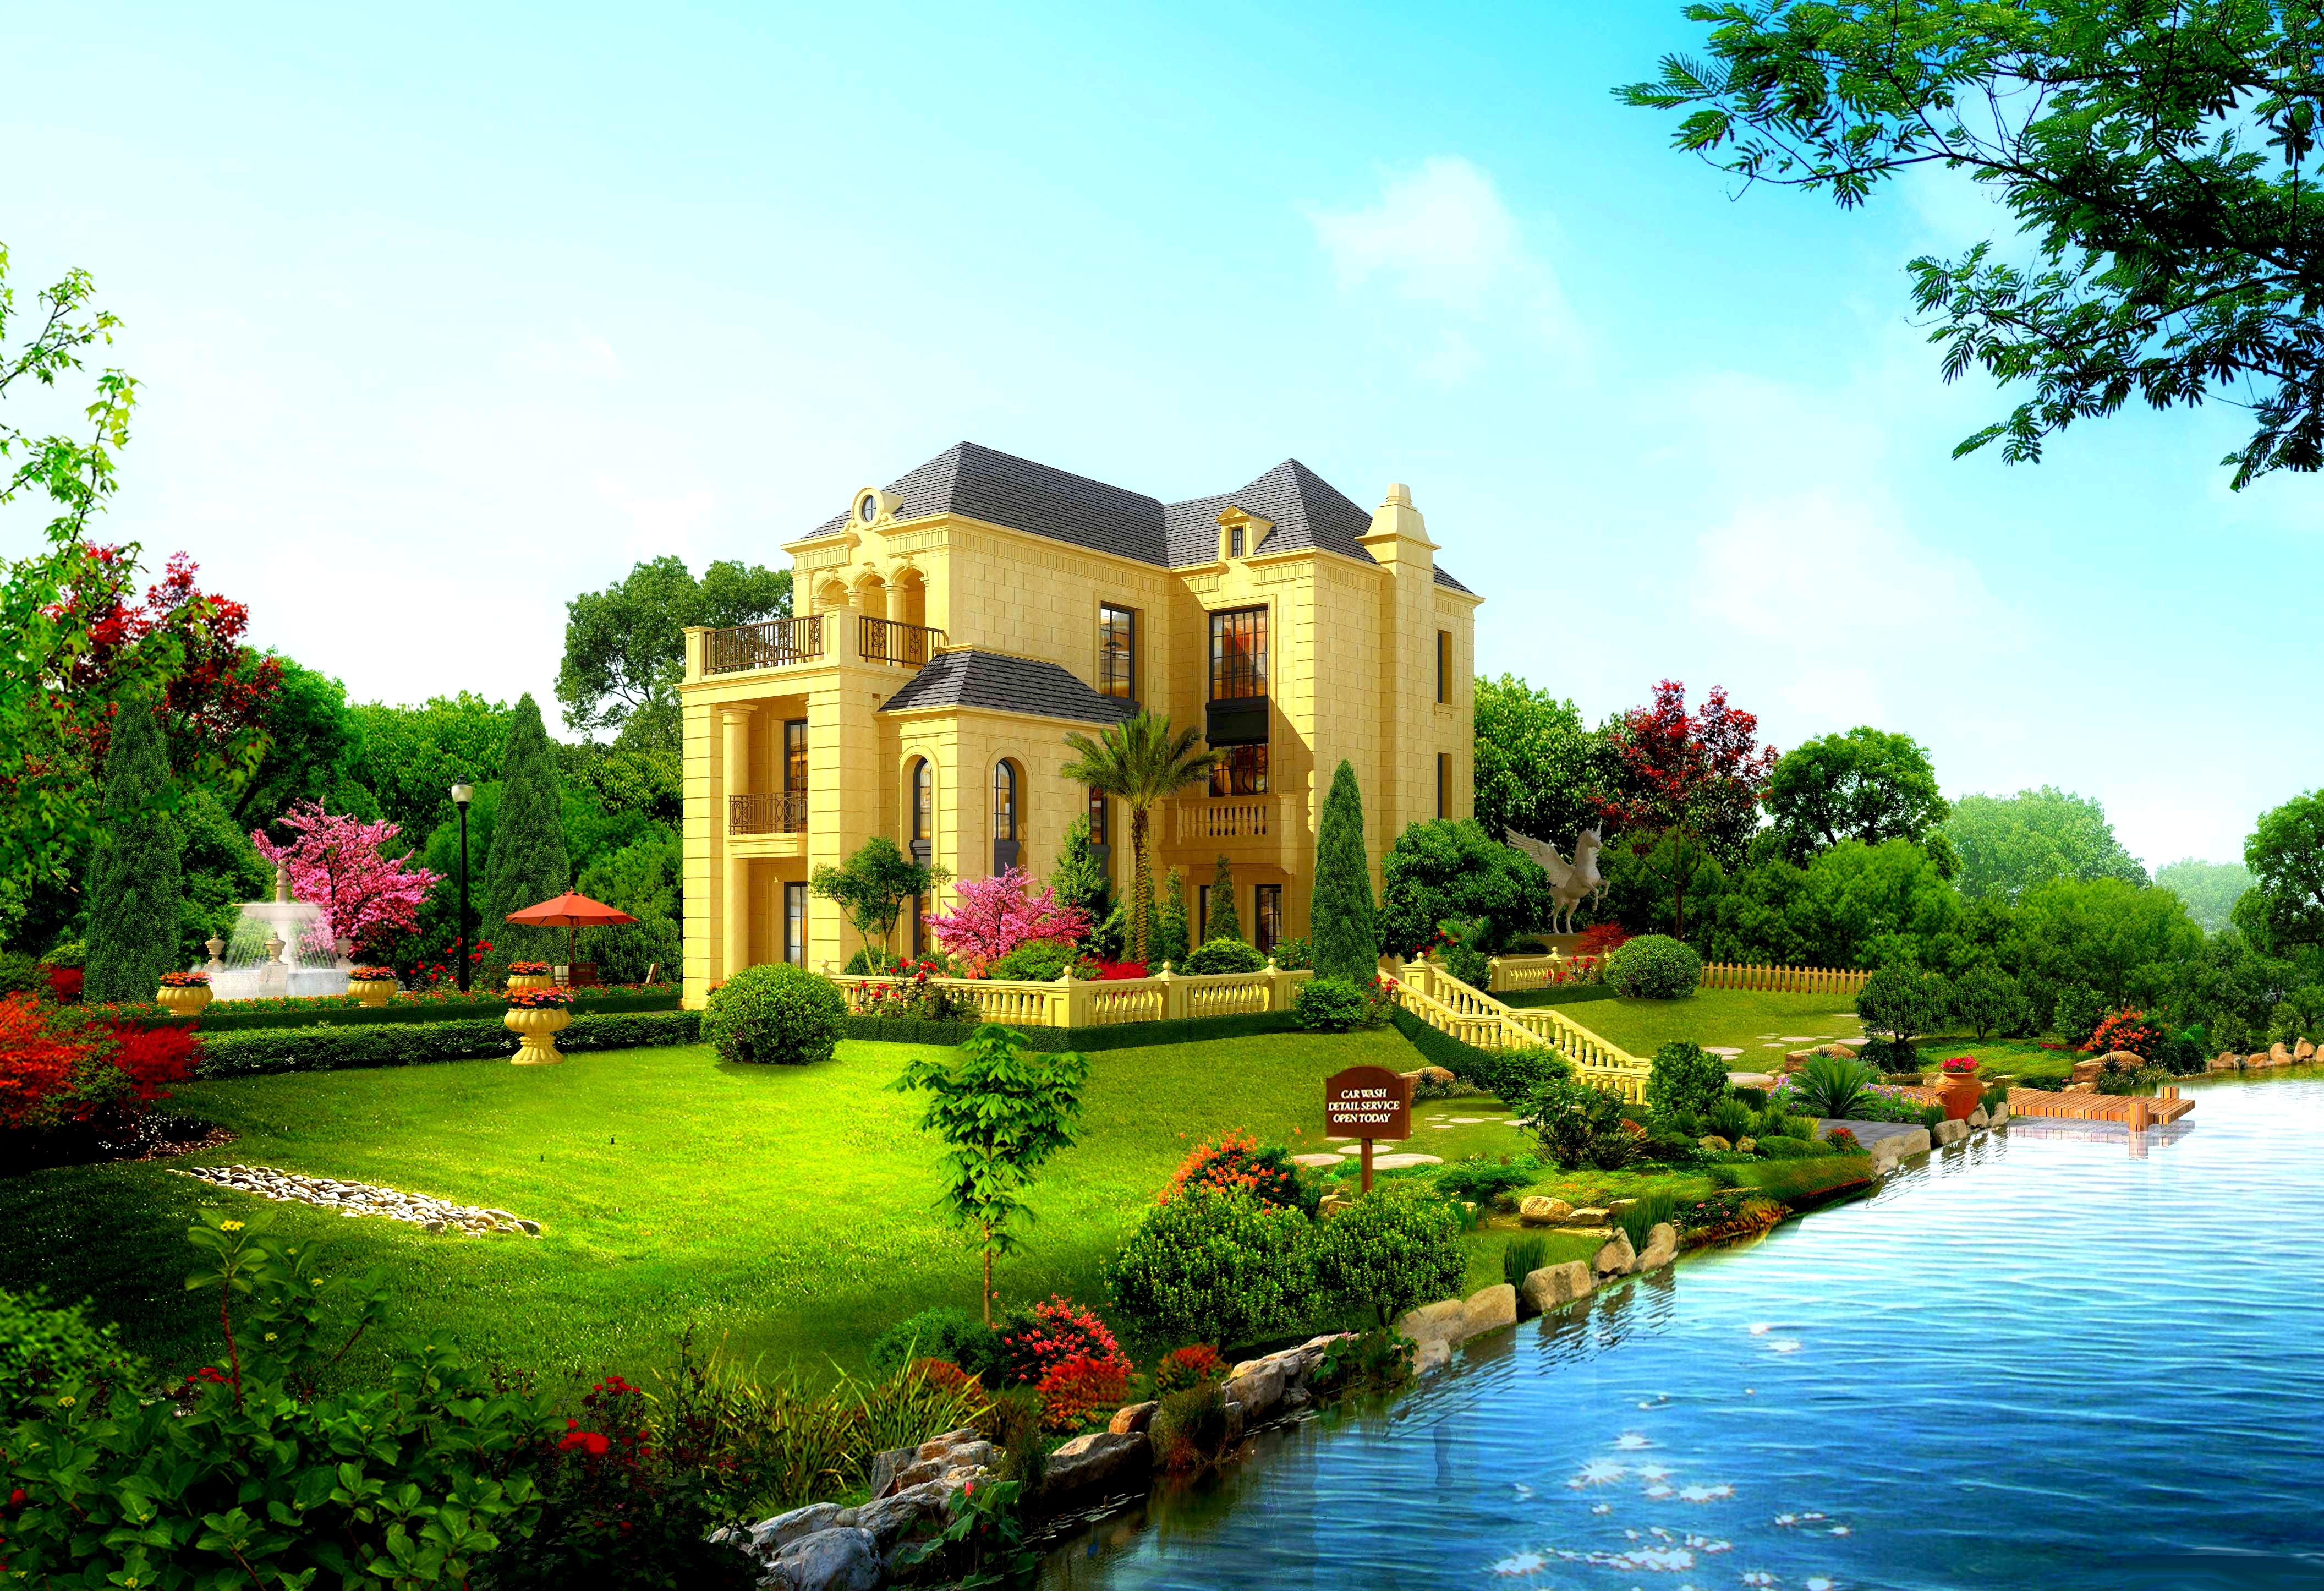 Beautiful house wallpaper 10490 PC en 4224x2891